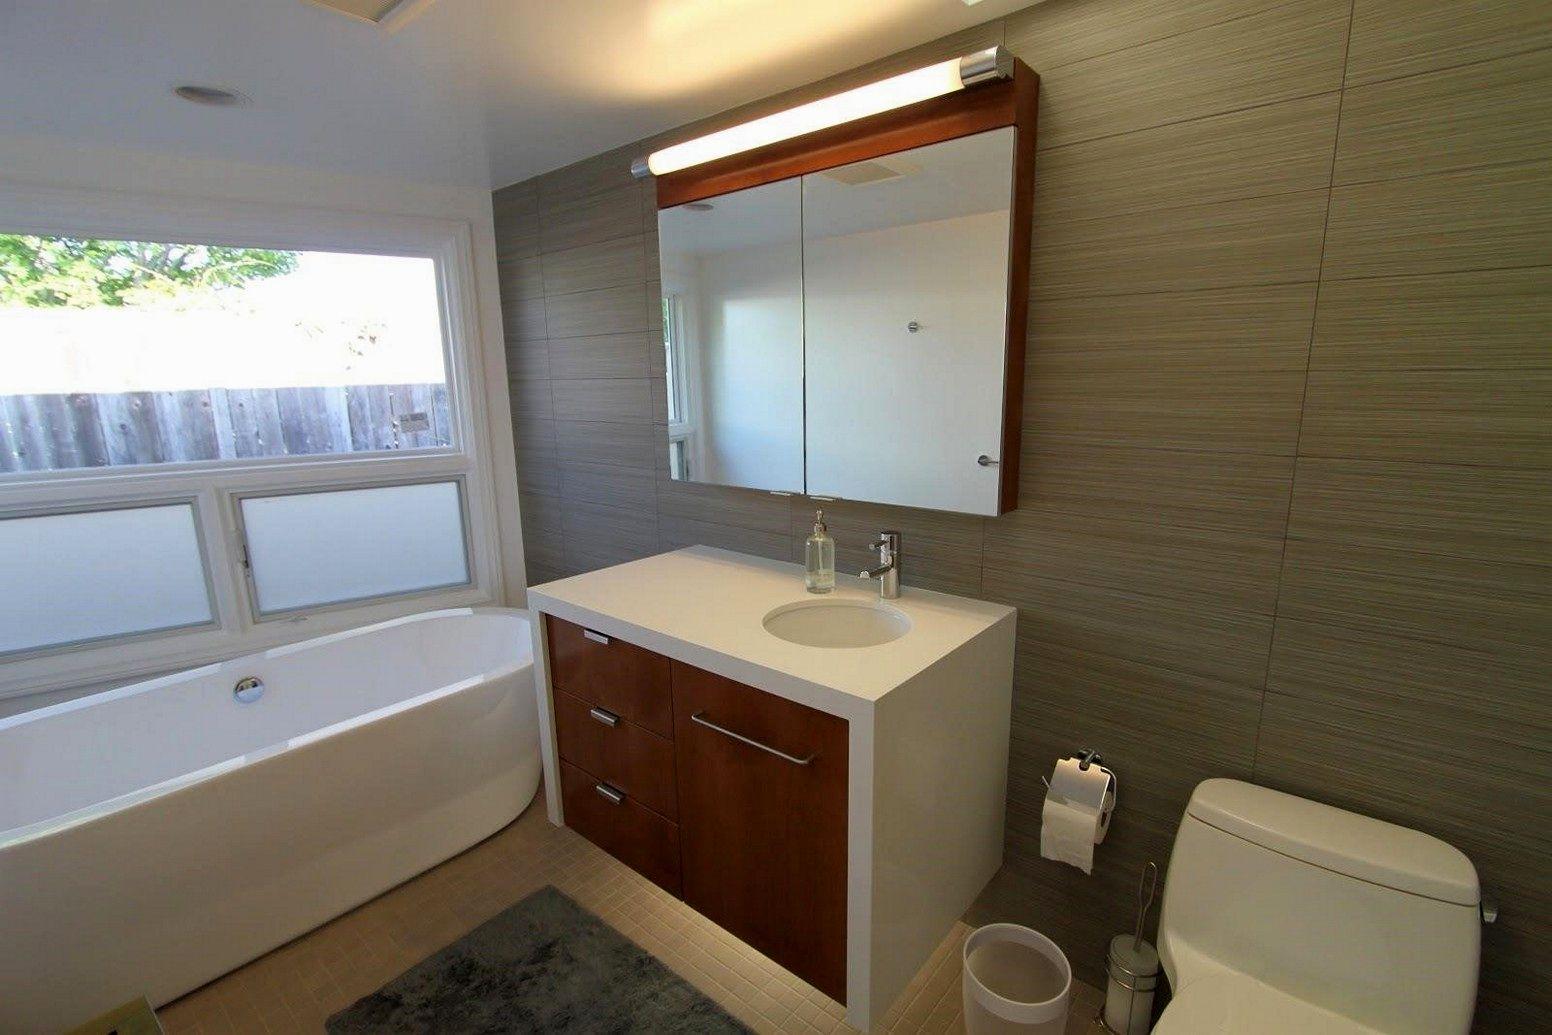 modern target bathroom shower curtains wallpaper-Awesome Target Bathroom Shower Curtains Plan